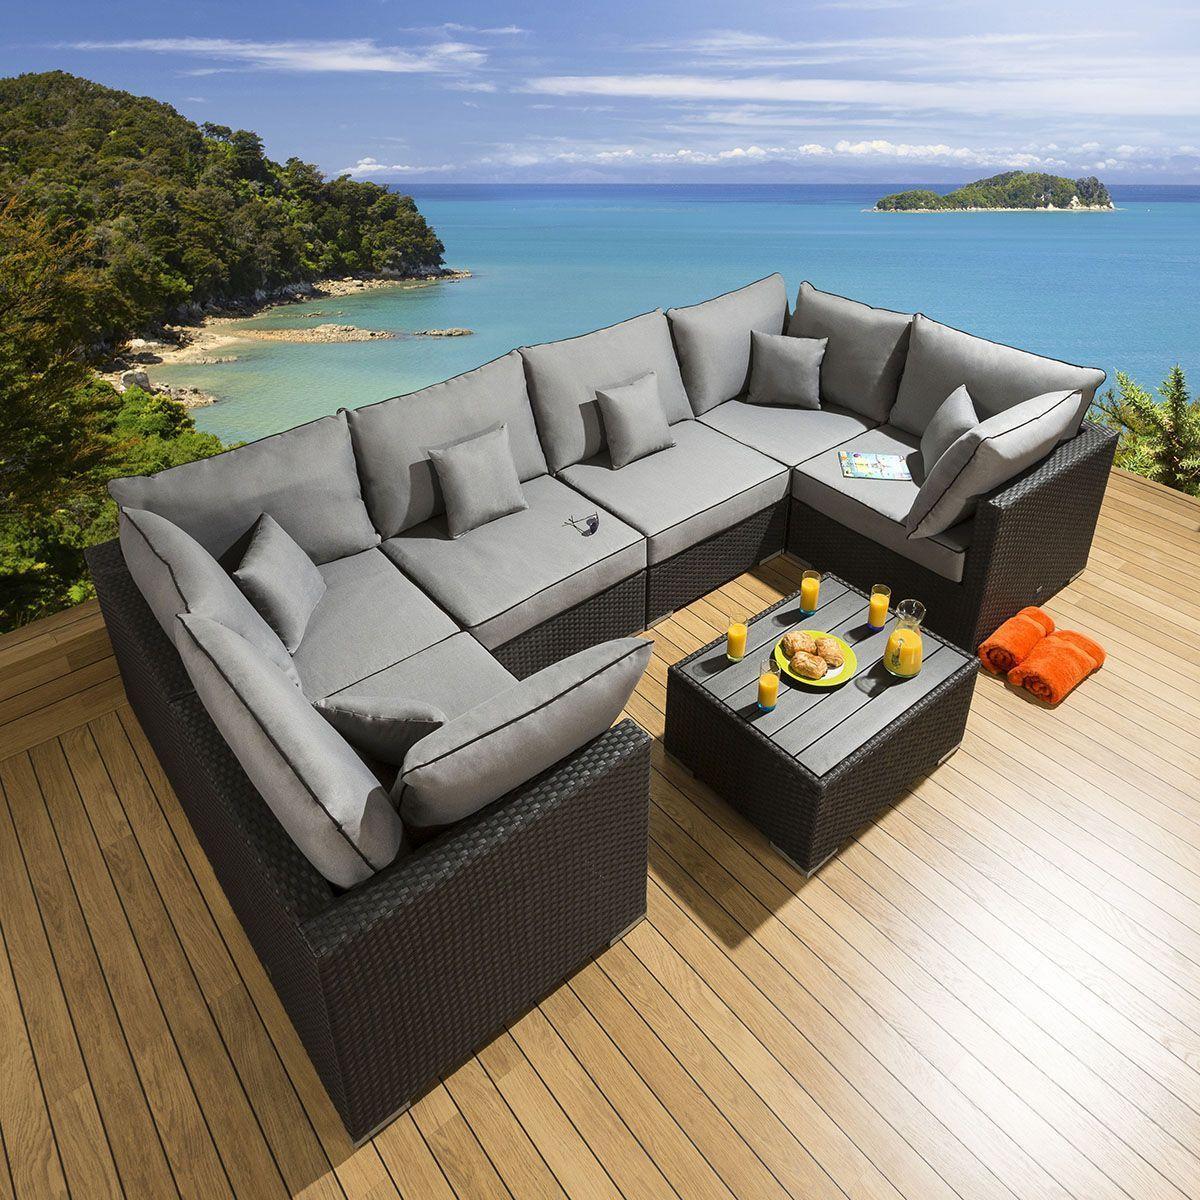 Conservatory Garden 6 Seater Corner Sofa Set Black Rattan Grey U4 Conservat In 2020 Corner Sofa Set Sofa Set Corner Sofa